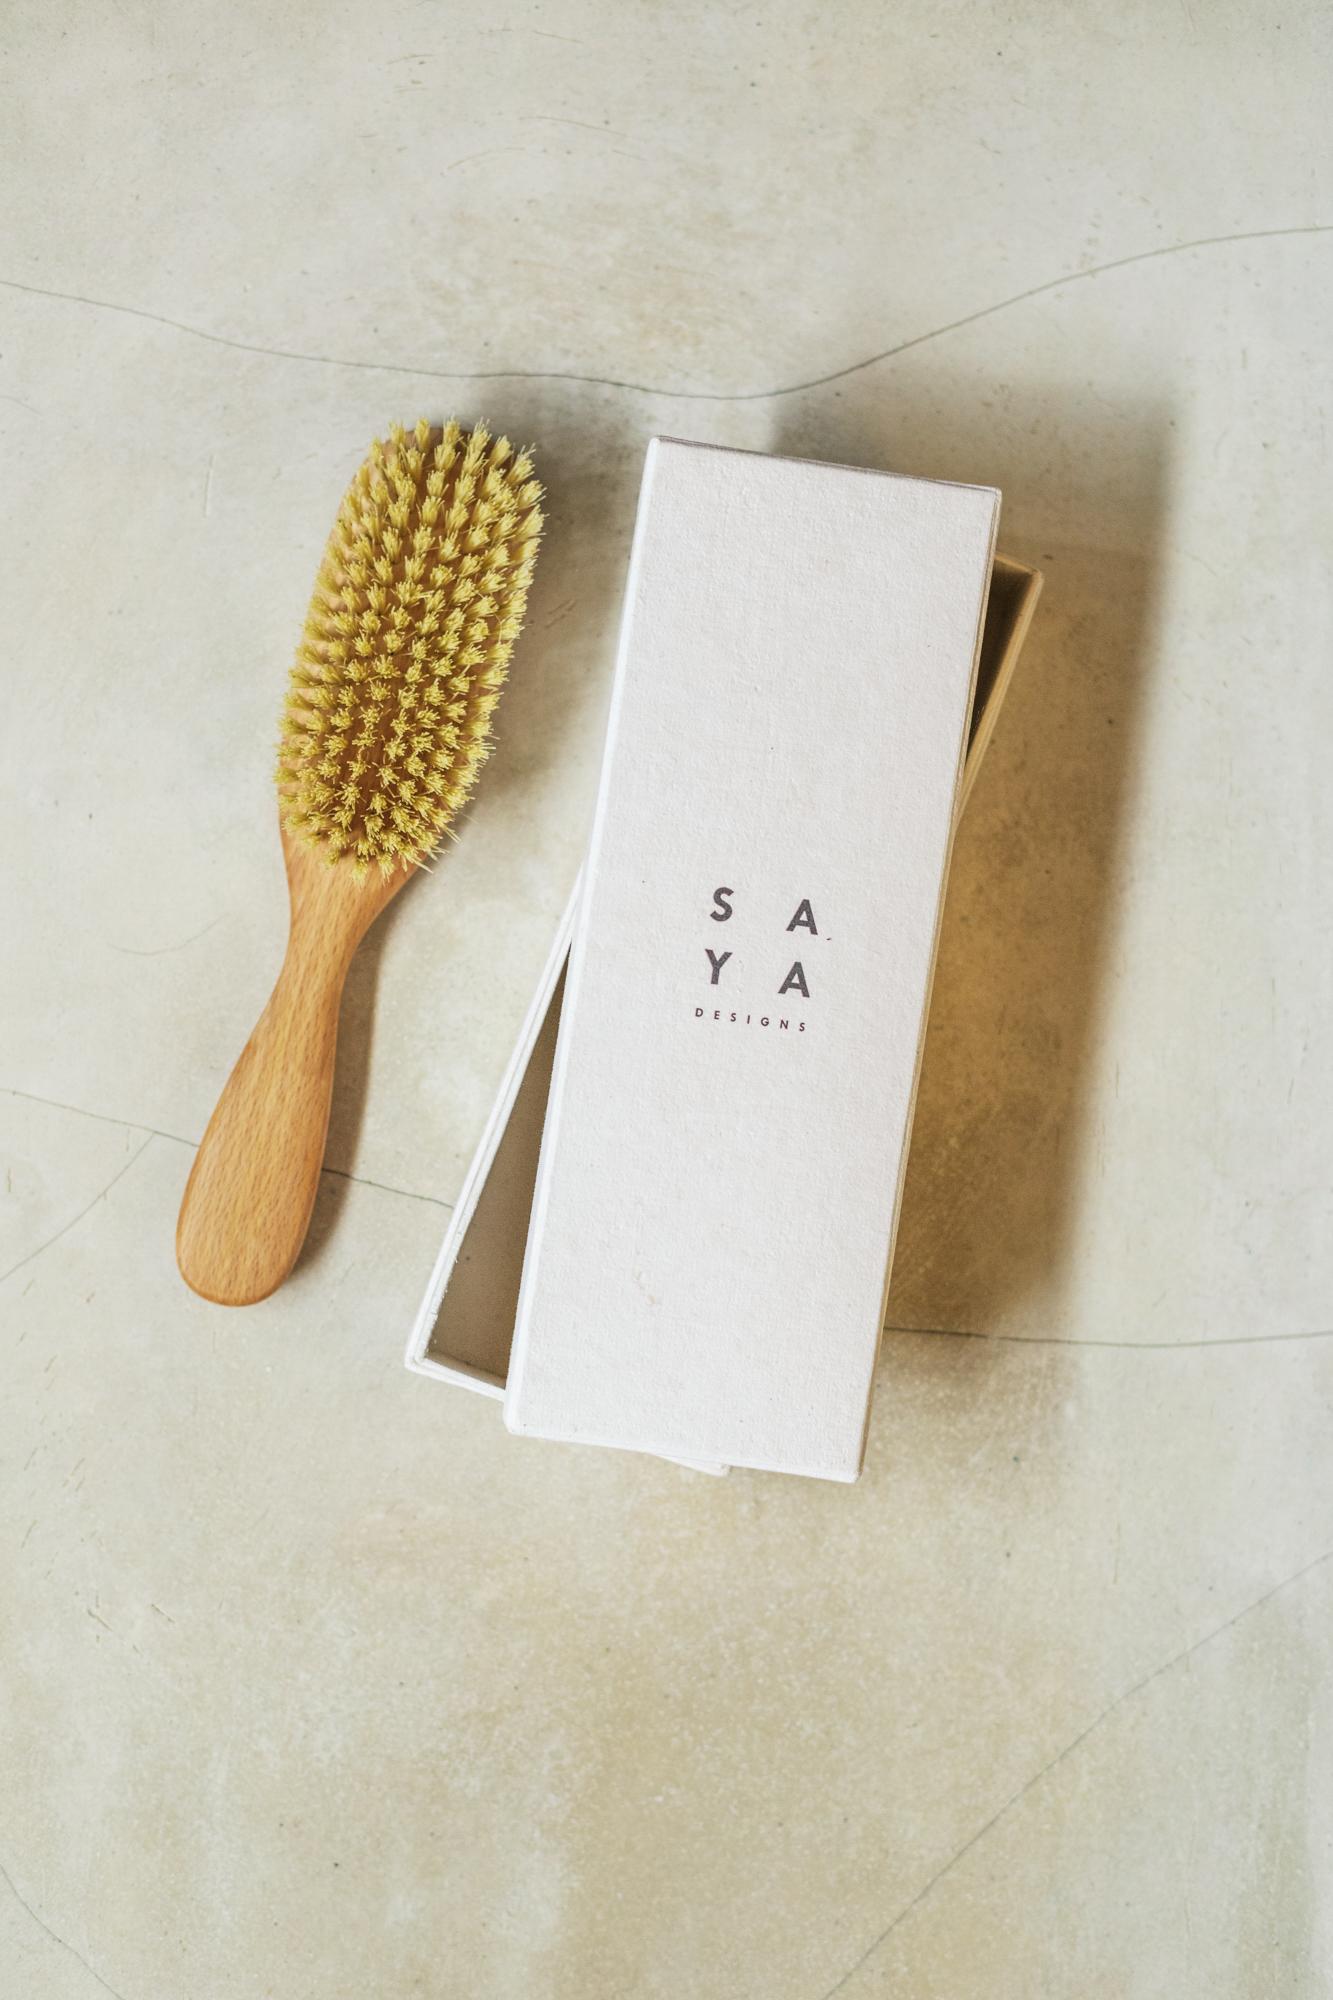 The Vegan Hair Brush SAYA Designs Natural Wooden Hair Brushes